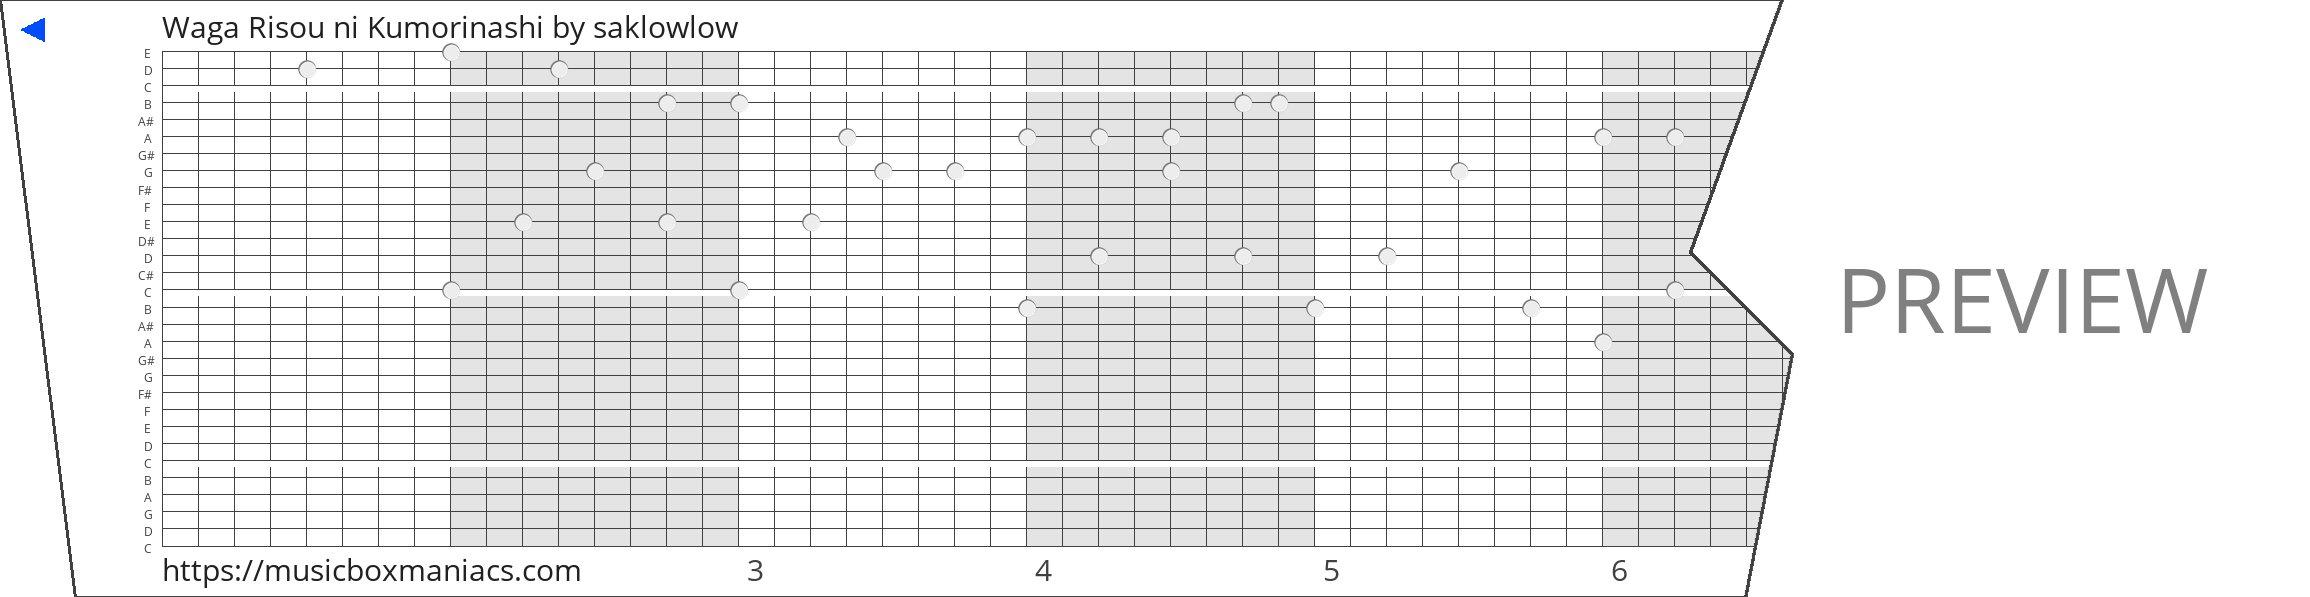 Waga Risou ni Kumorinashi 30 note music box paper strip